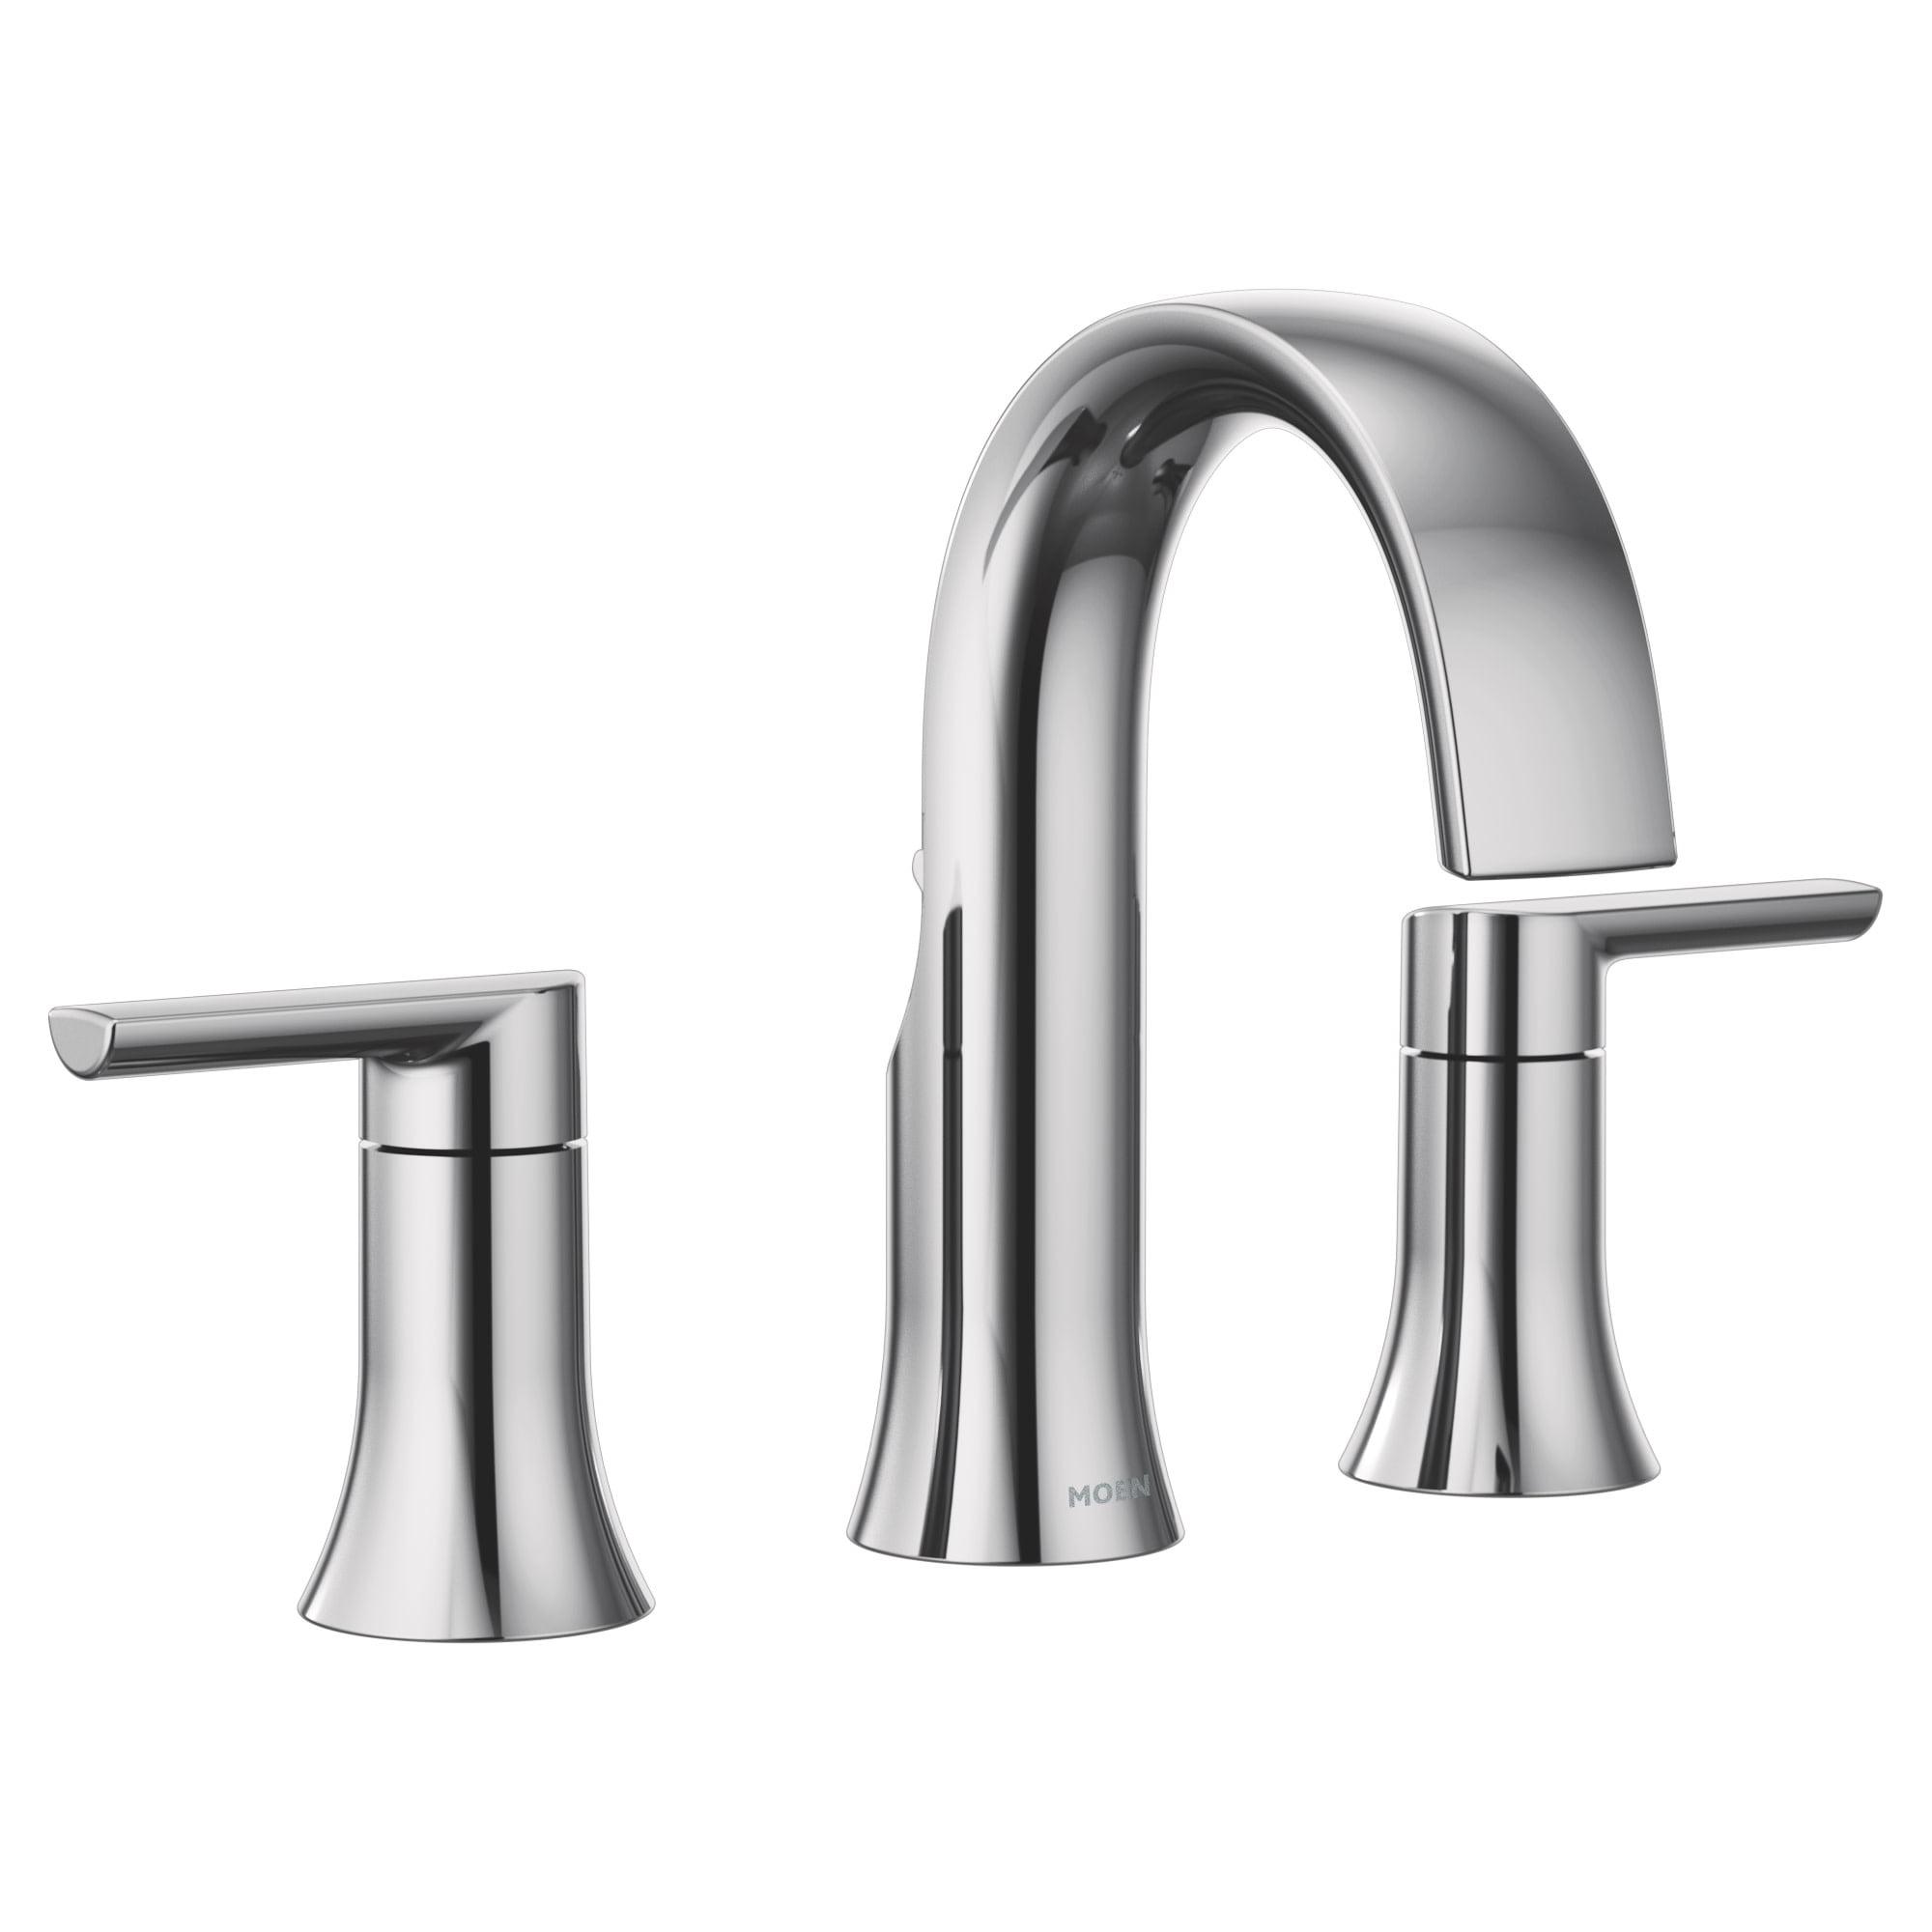 Moen Ts6925 Doux 1 2 Gpm Widespread, Moen Chrome Bathroom Faucet